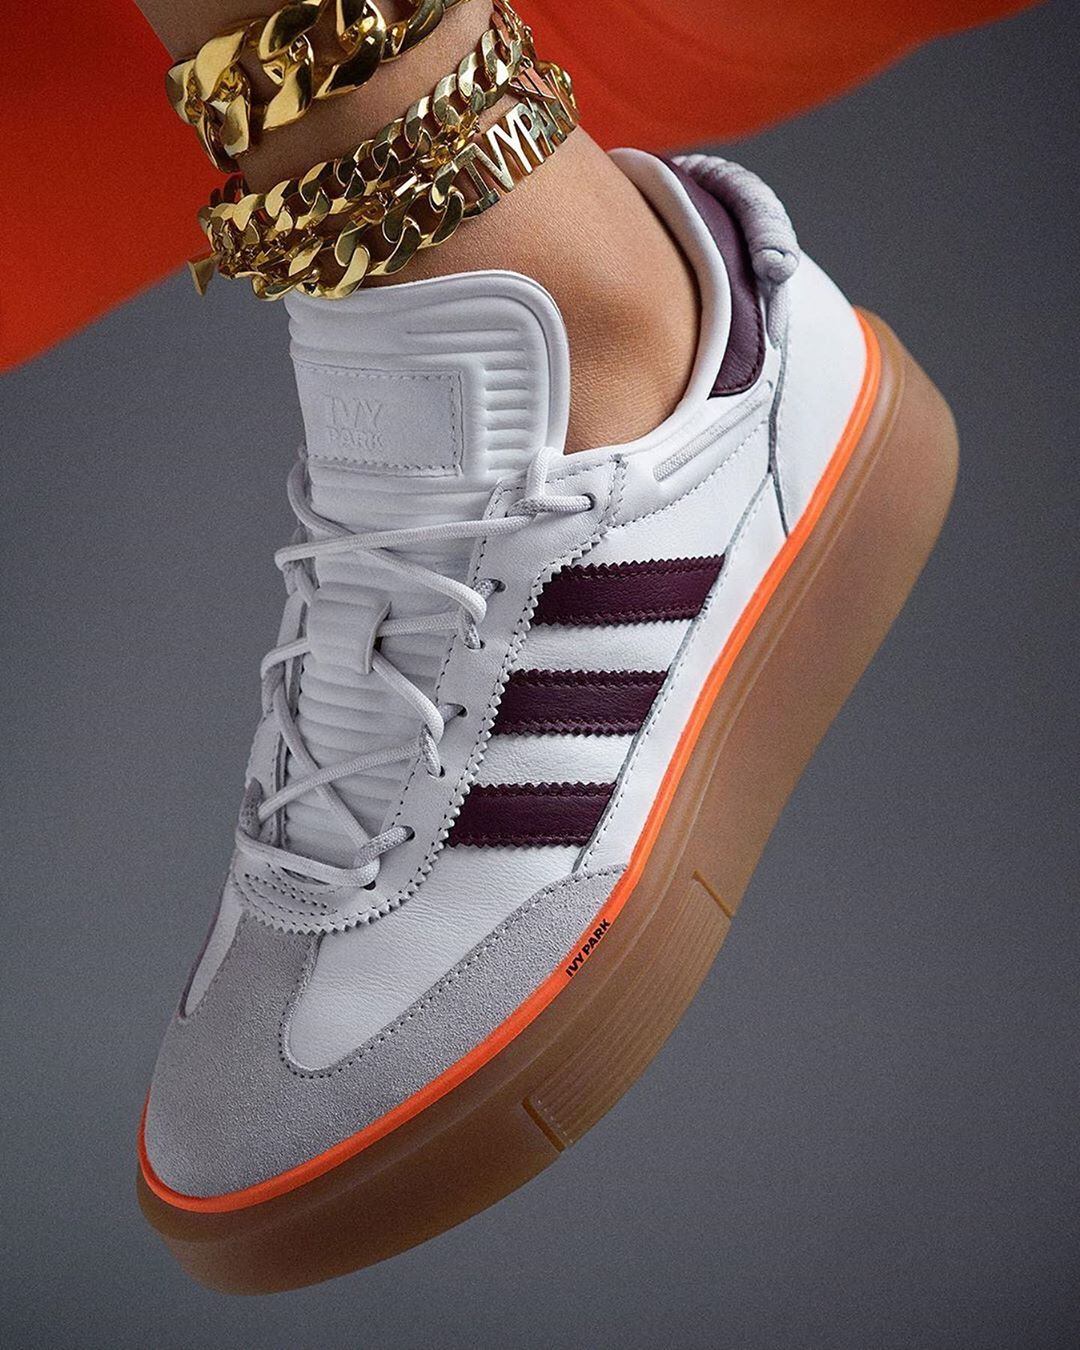 Sneaker Beyonce x Adidas - Neomag.